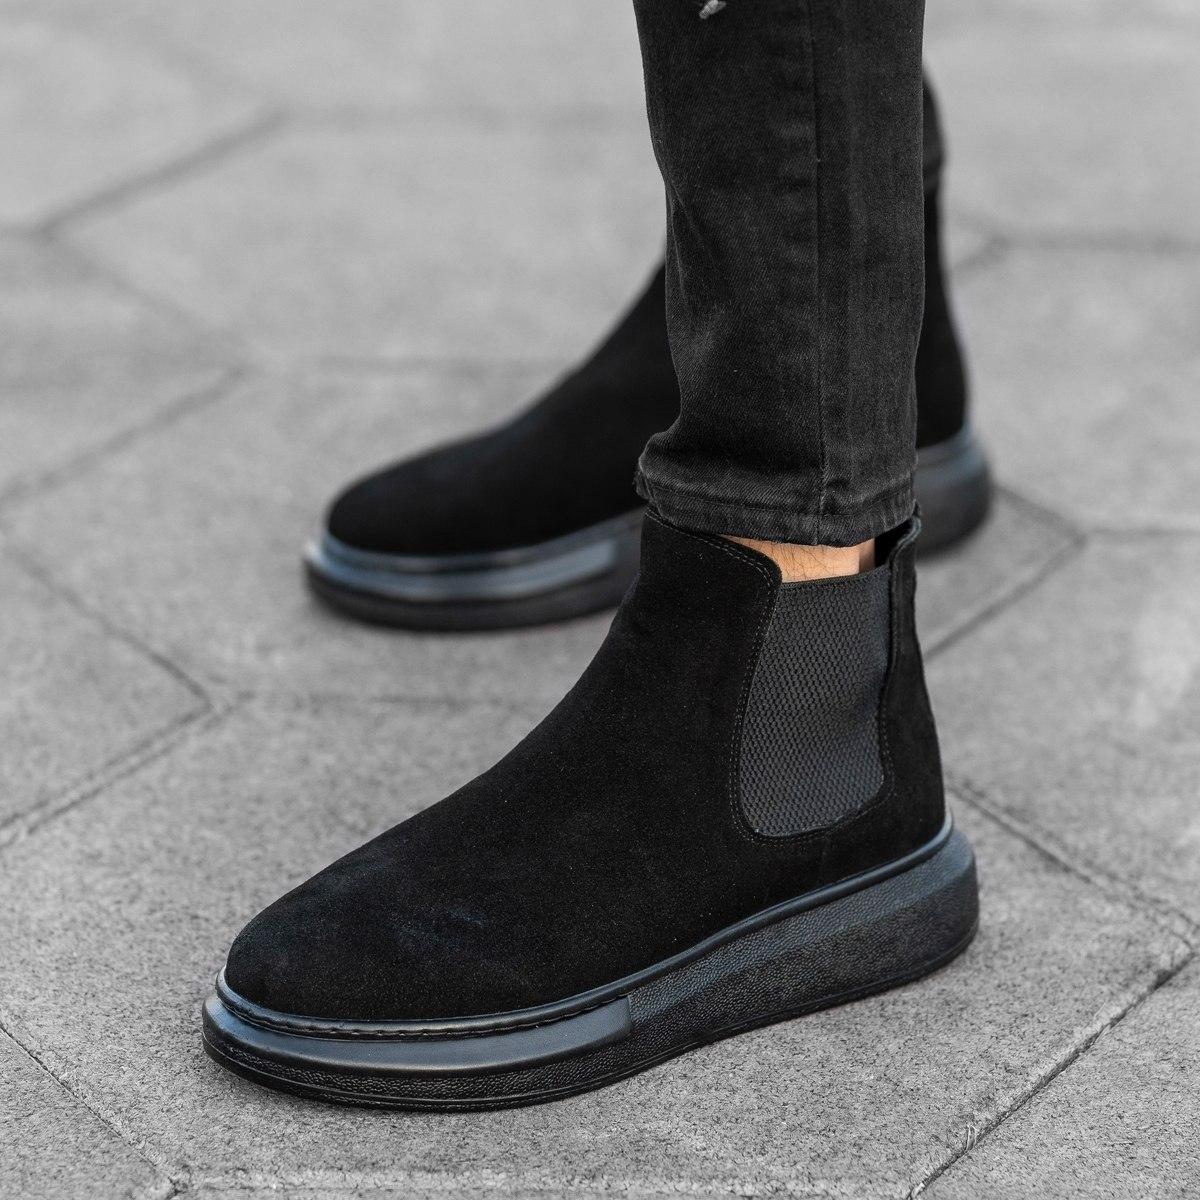 Genuine-Suede Hype Sole Chelsea Boots In Black Mv Premium Brand - 3